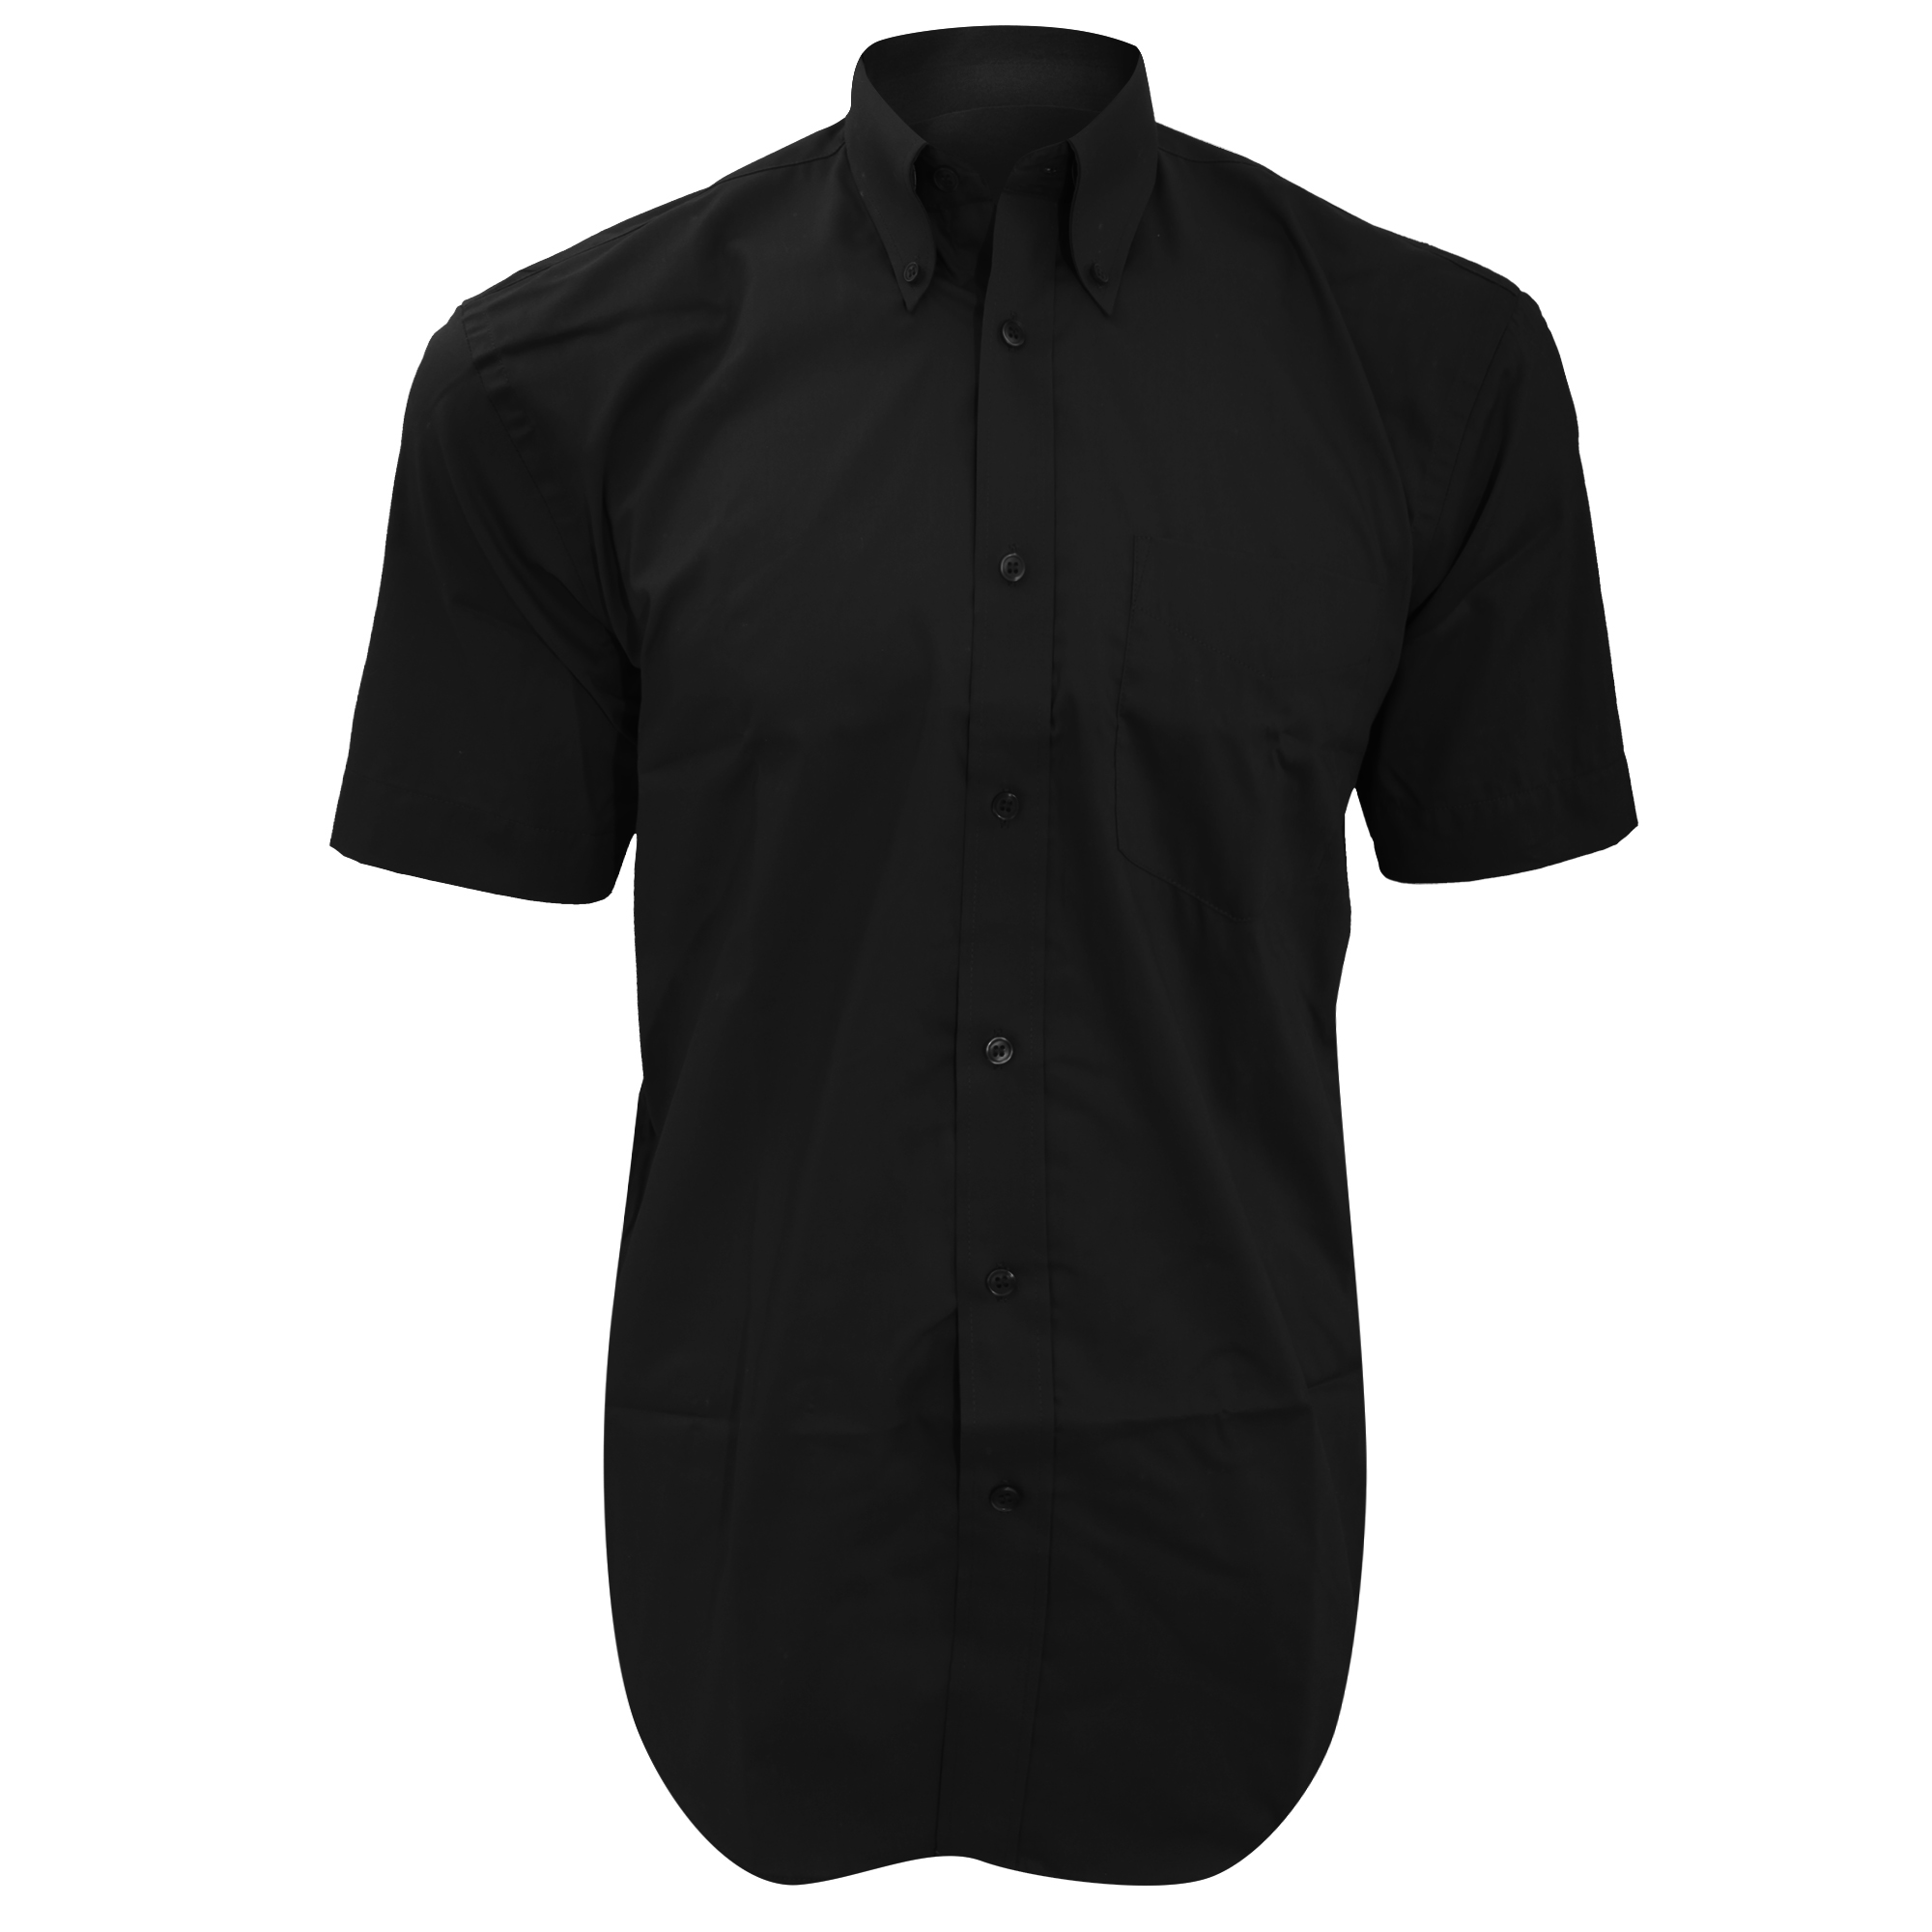 Kustom Kit Mens Short Sleeve Corporate Oxford Shirt (20inch) (Black)